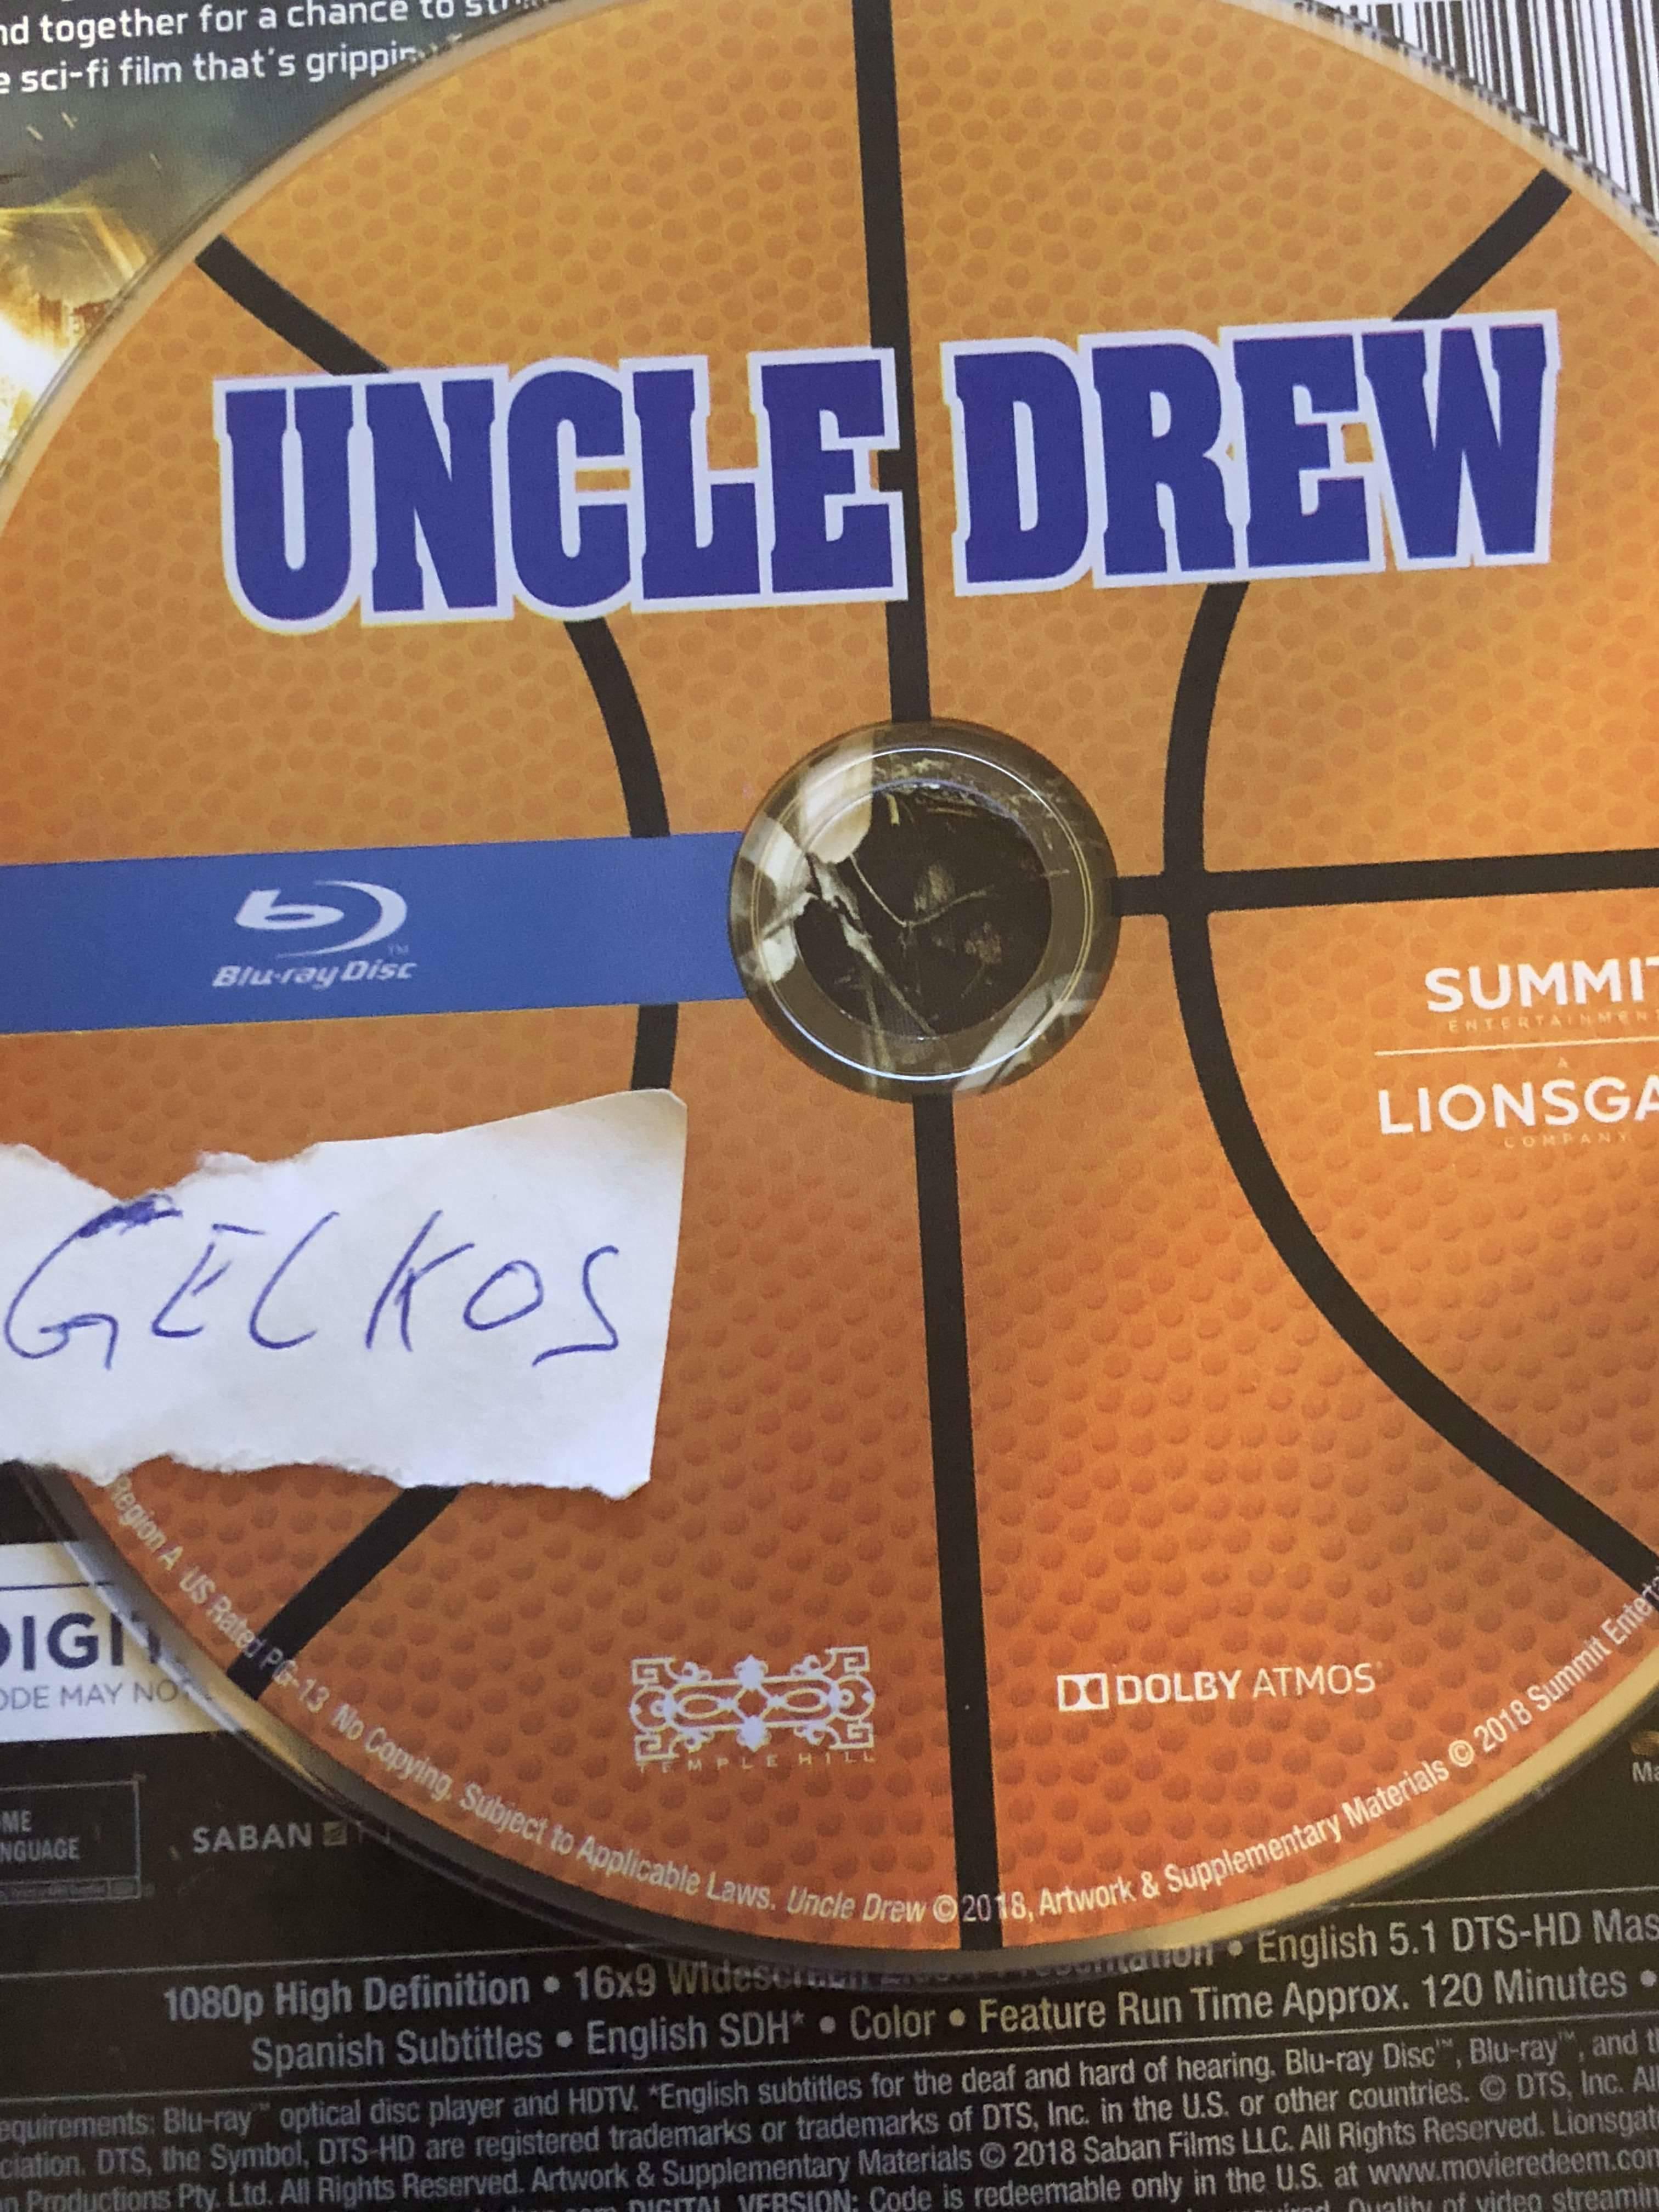 Uncle Drew 2018 BDRip x264-GECKOS[EtMovies]